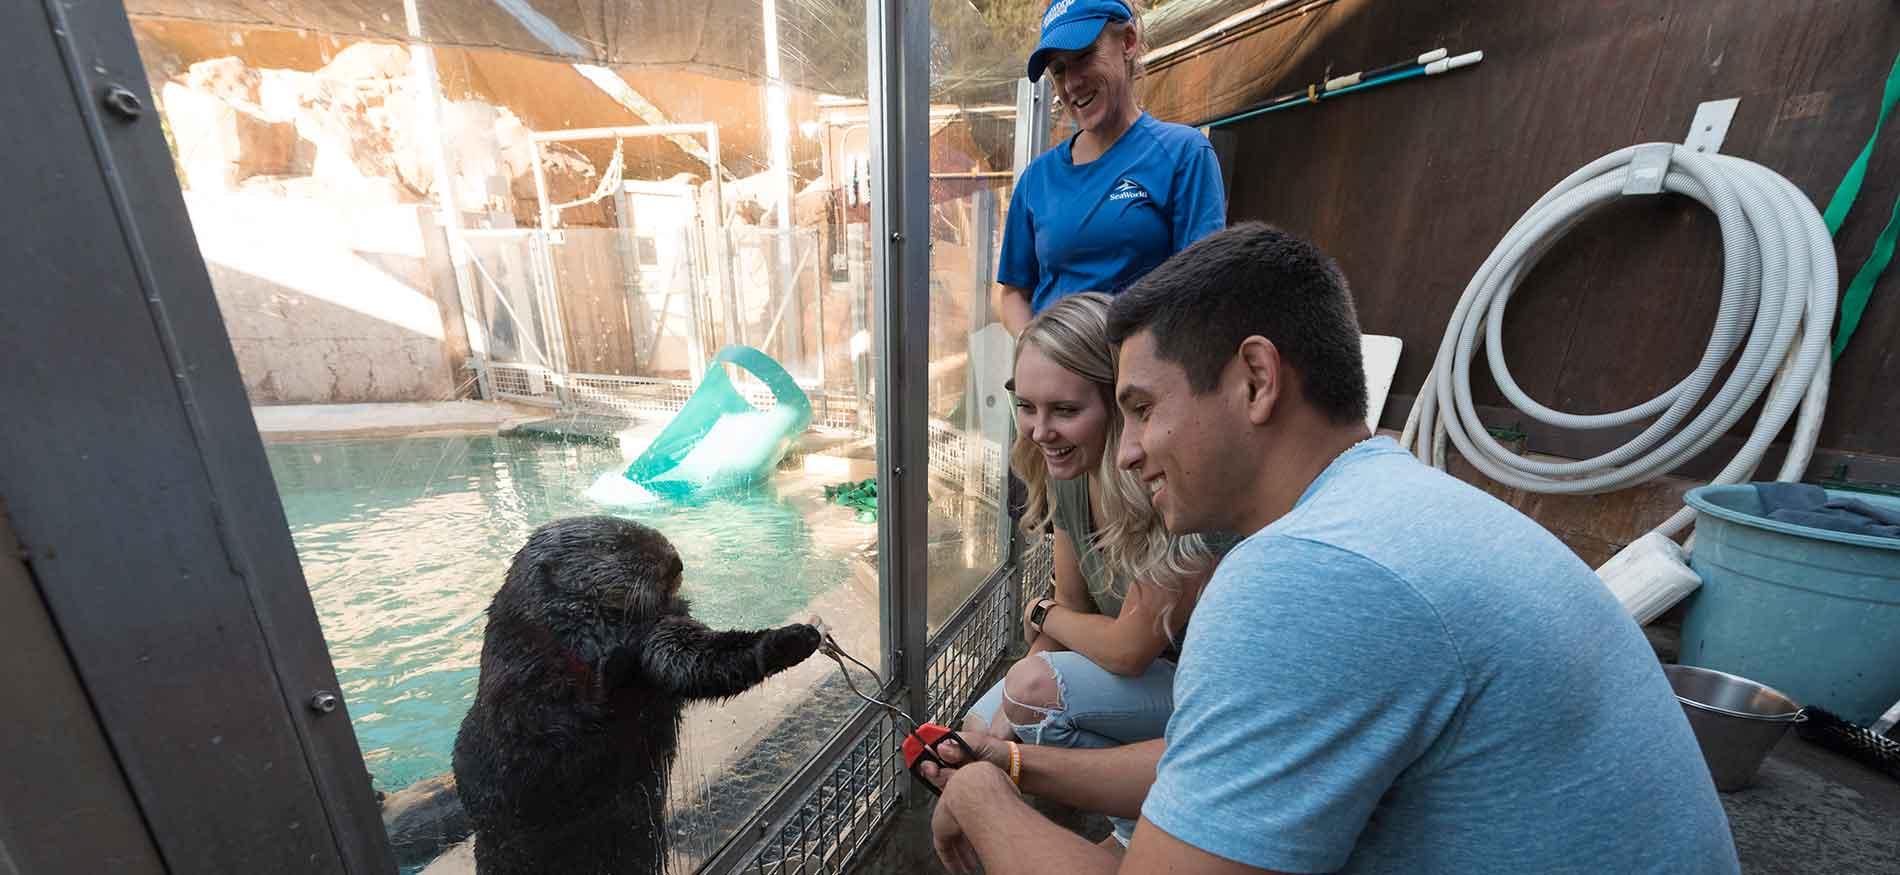 Sea Otter Encounter at SeaWorld San Diego